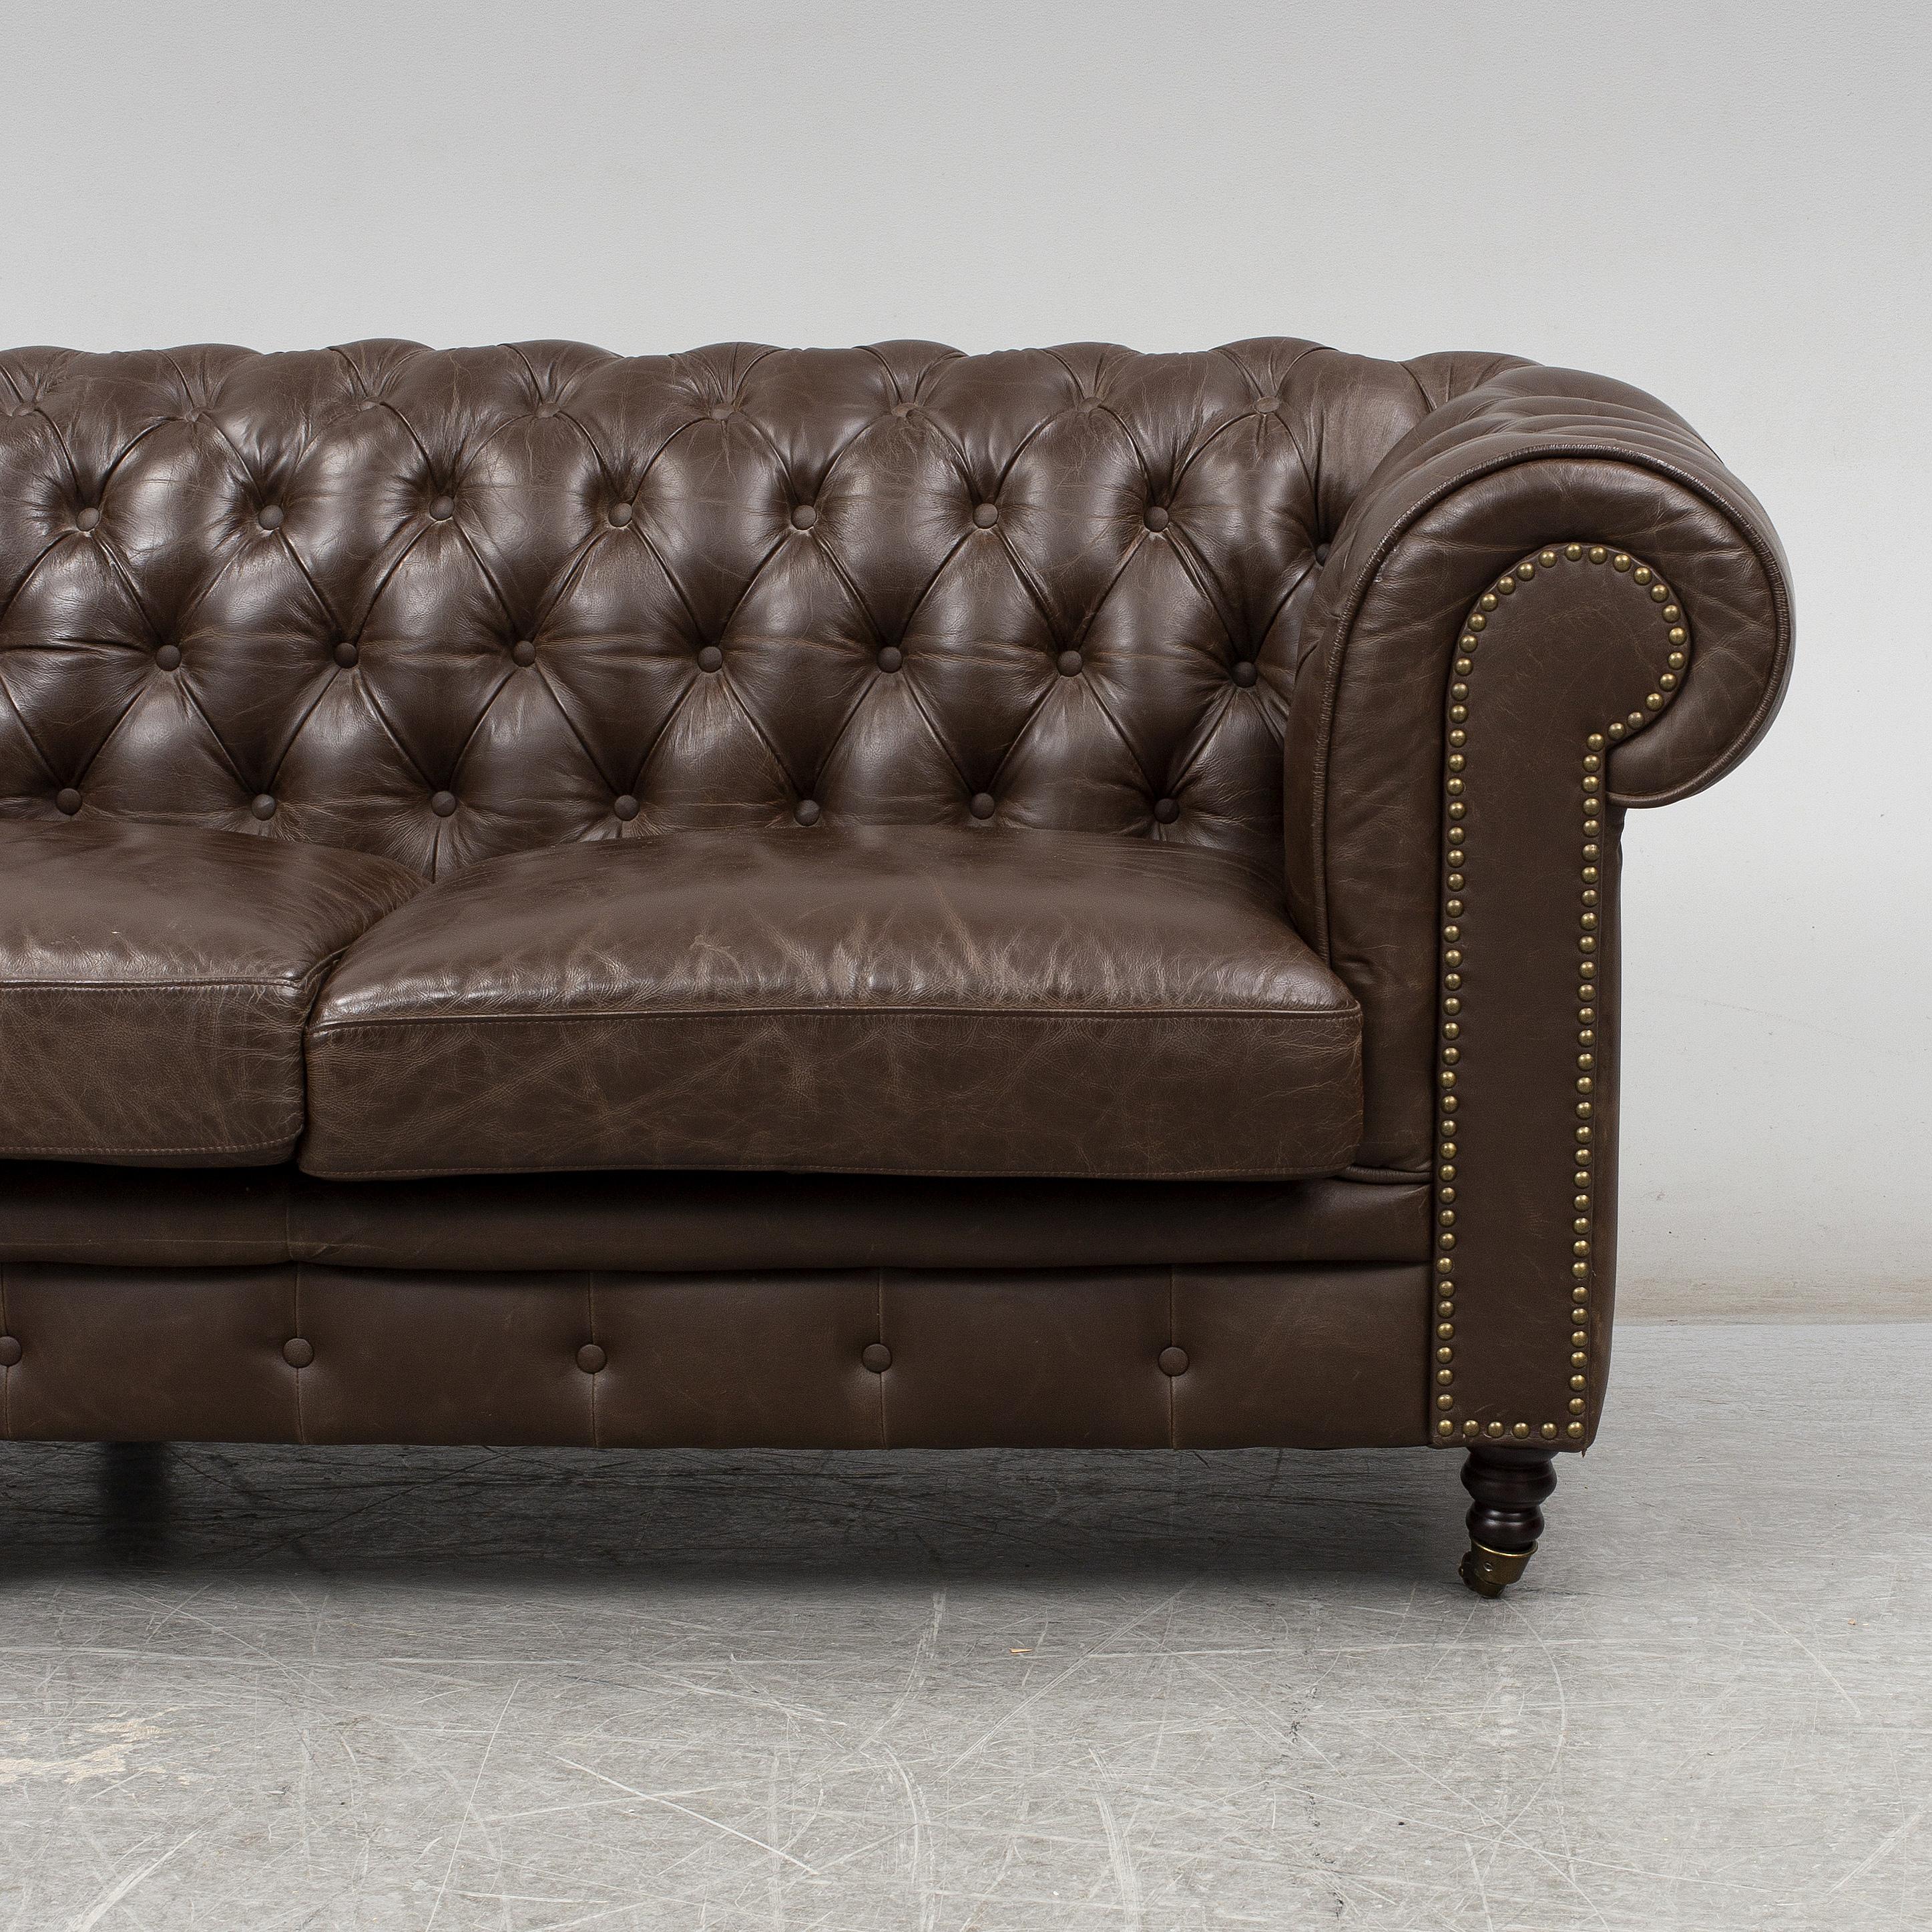 A modern chesterfield sofa. - Bukowskis